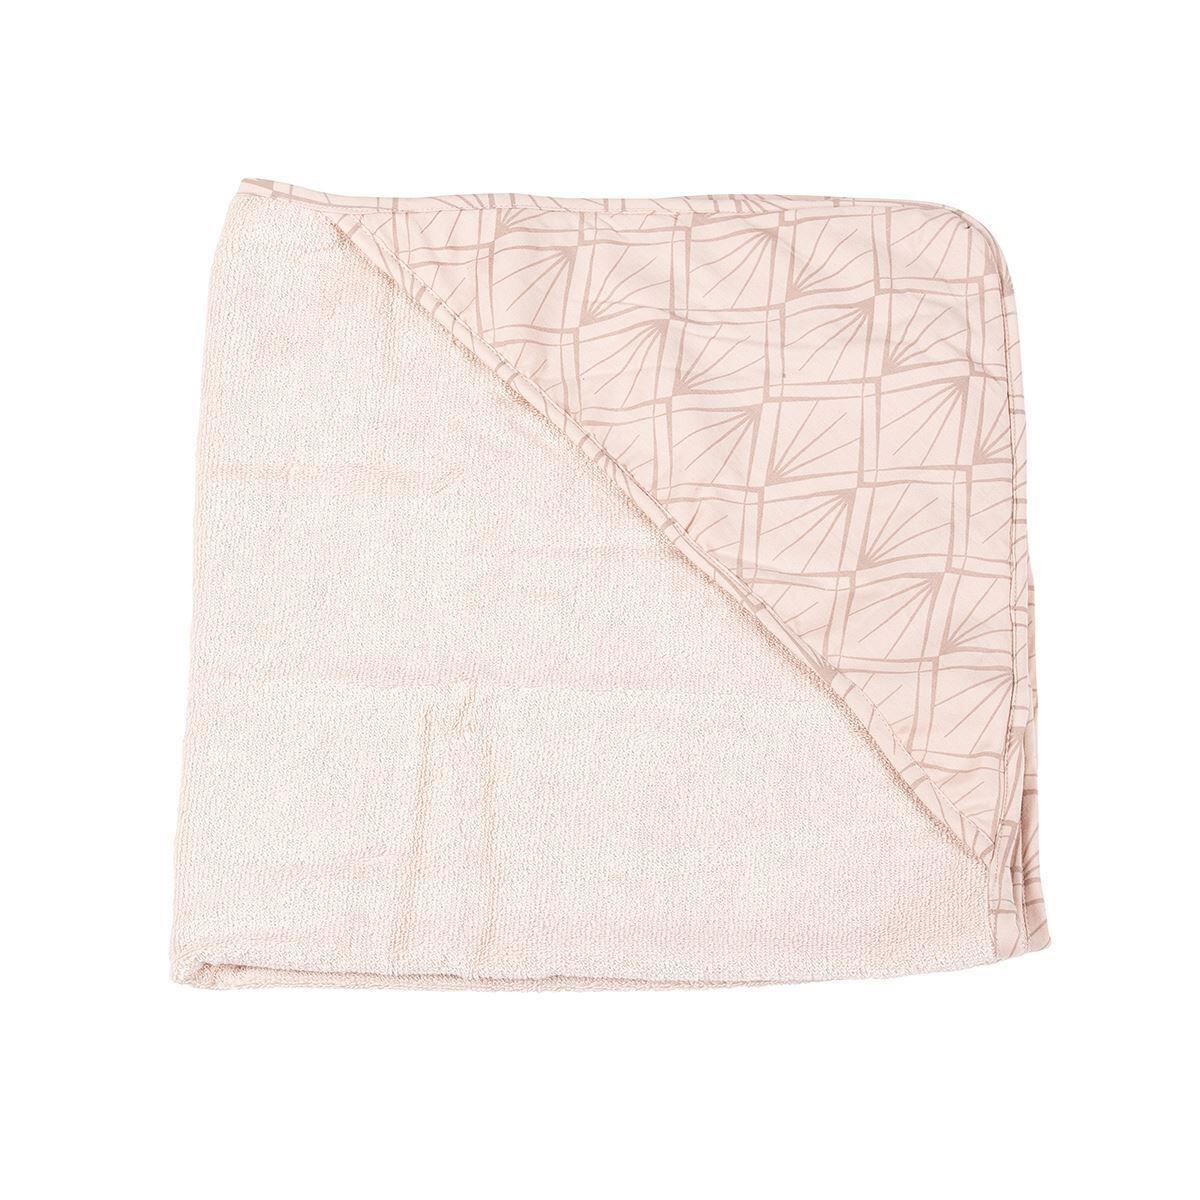 Markland Badehåndkle, Rosa